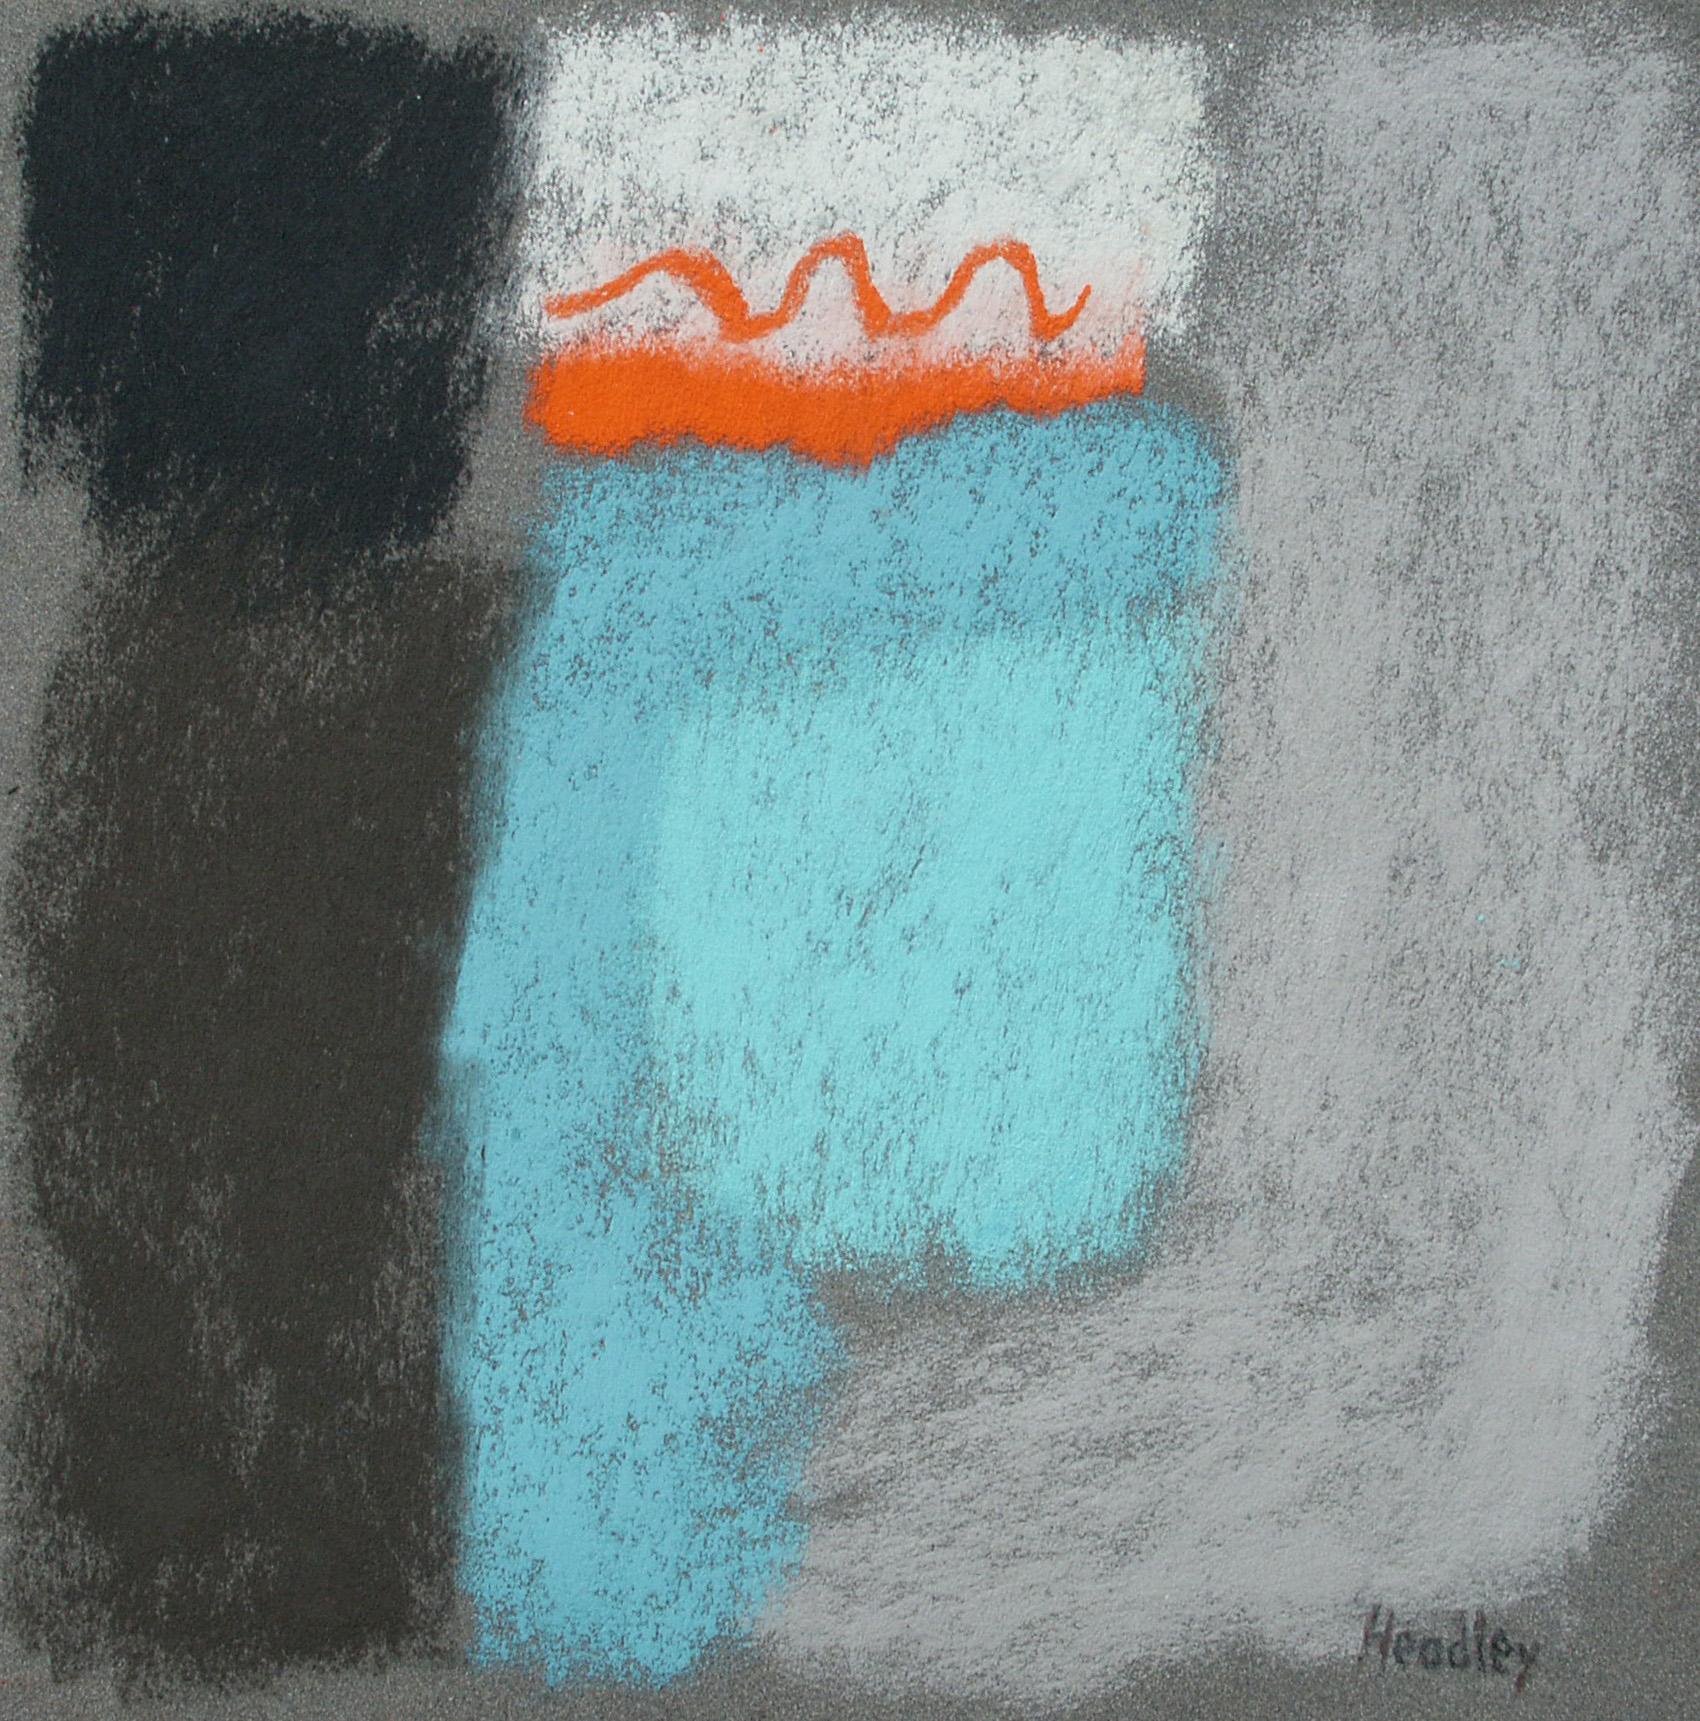 Catherine Headley, Turquoise Shallows